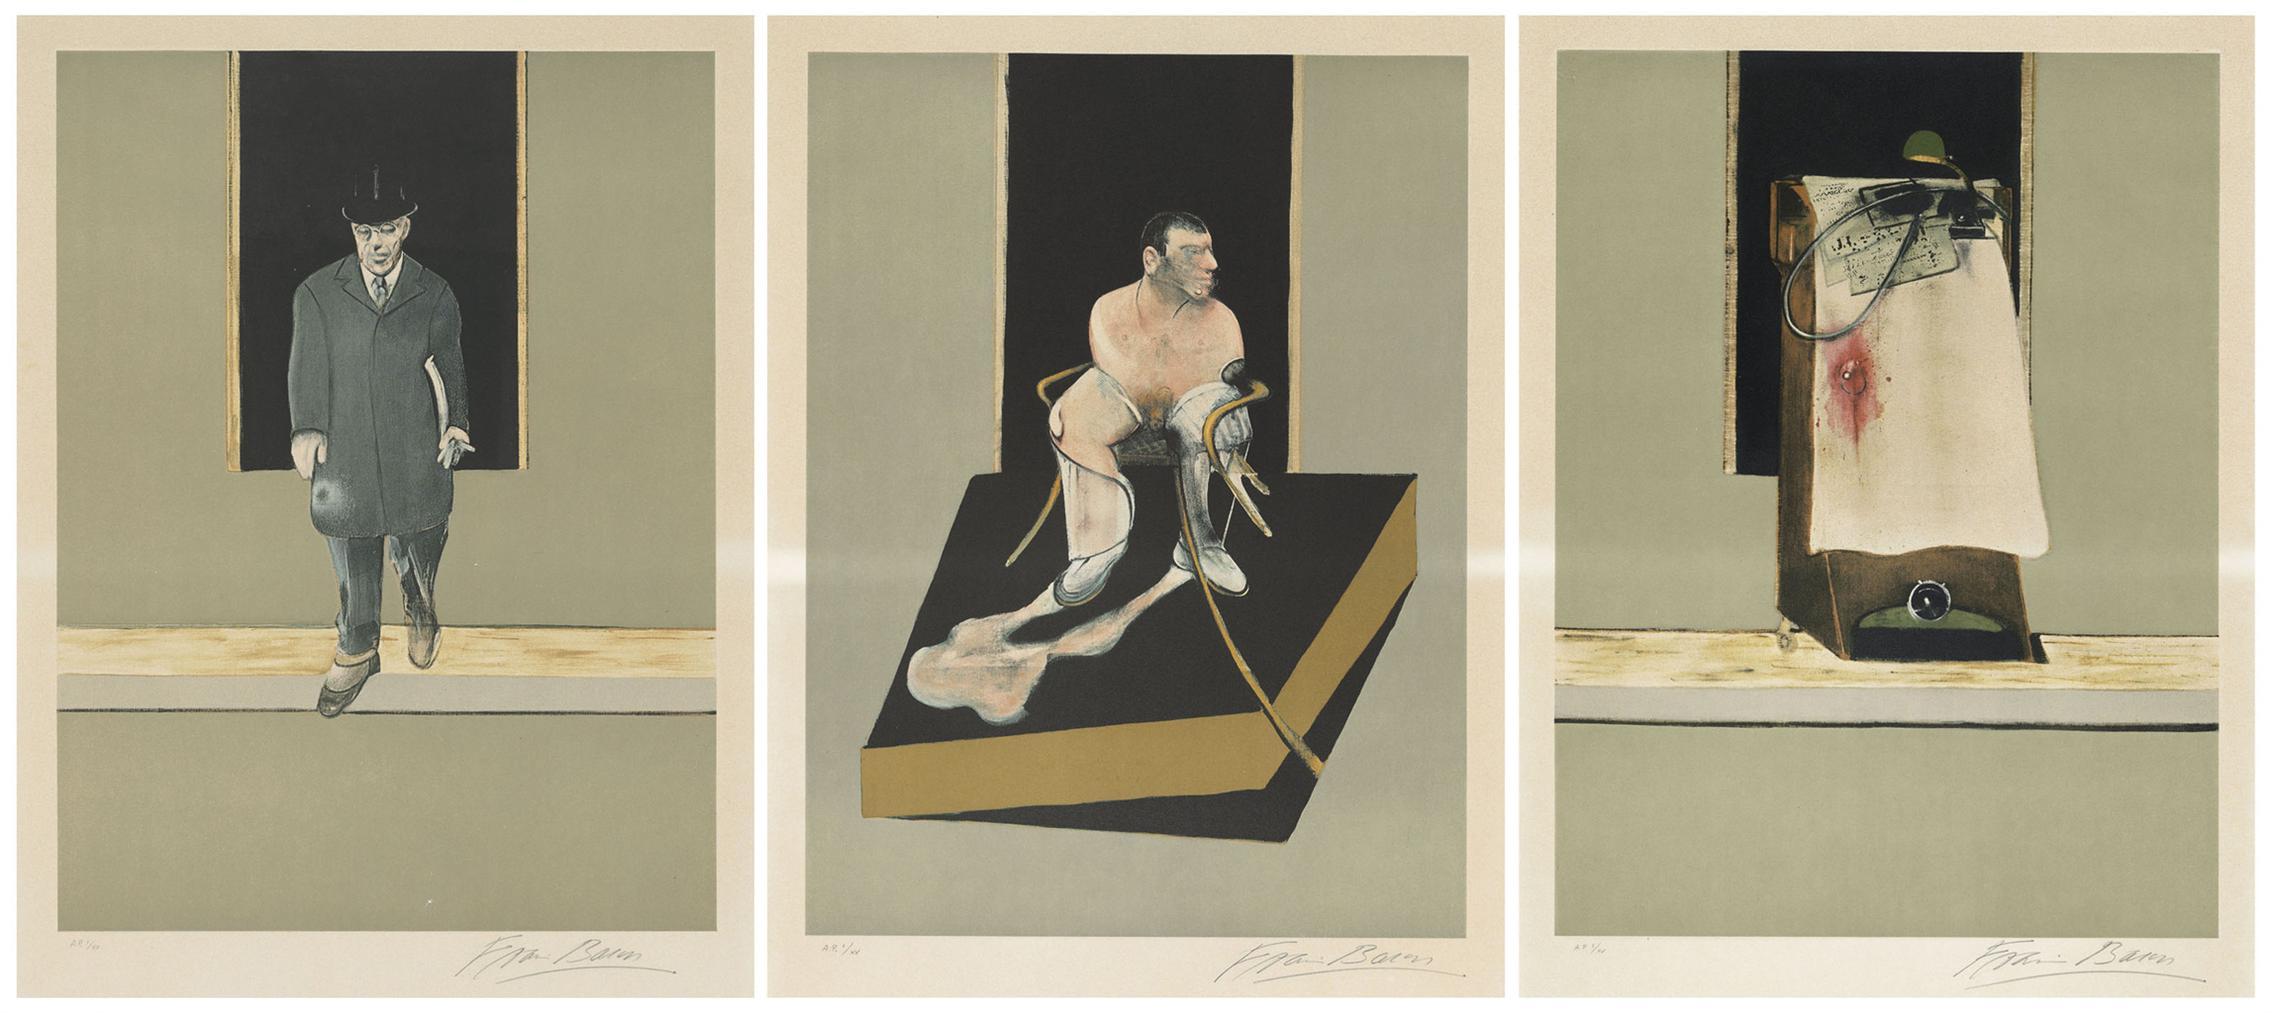 Francis Bacon-Triptych 1986-1987-1983